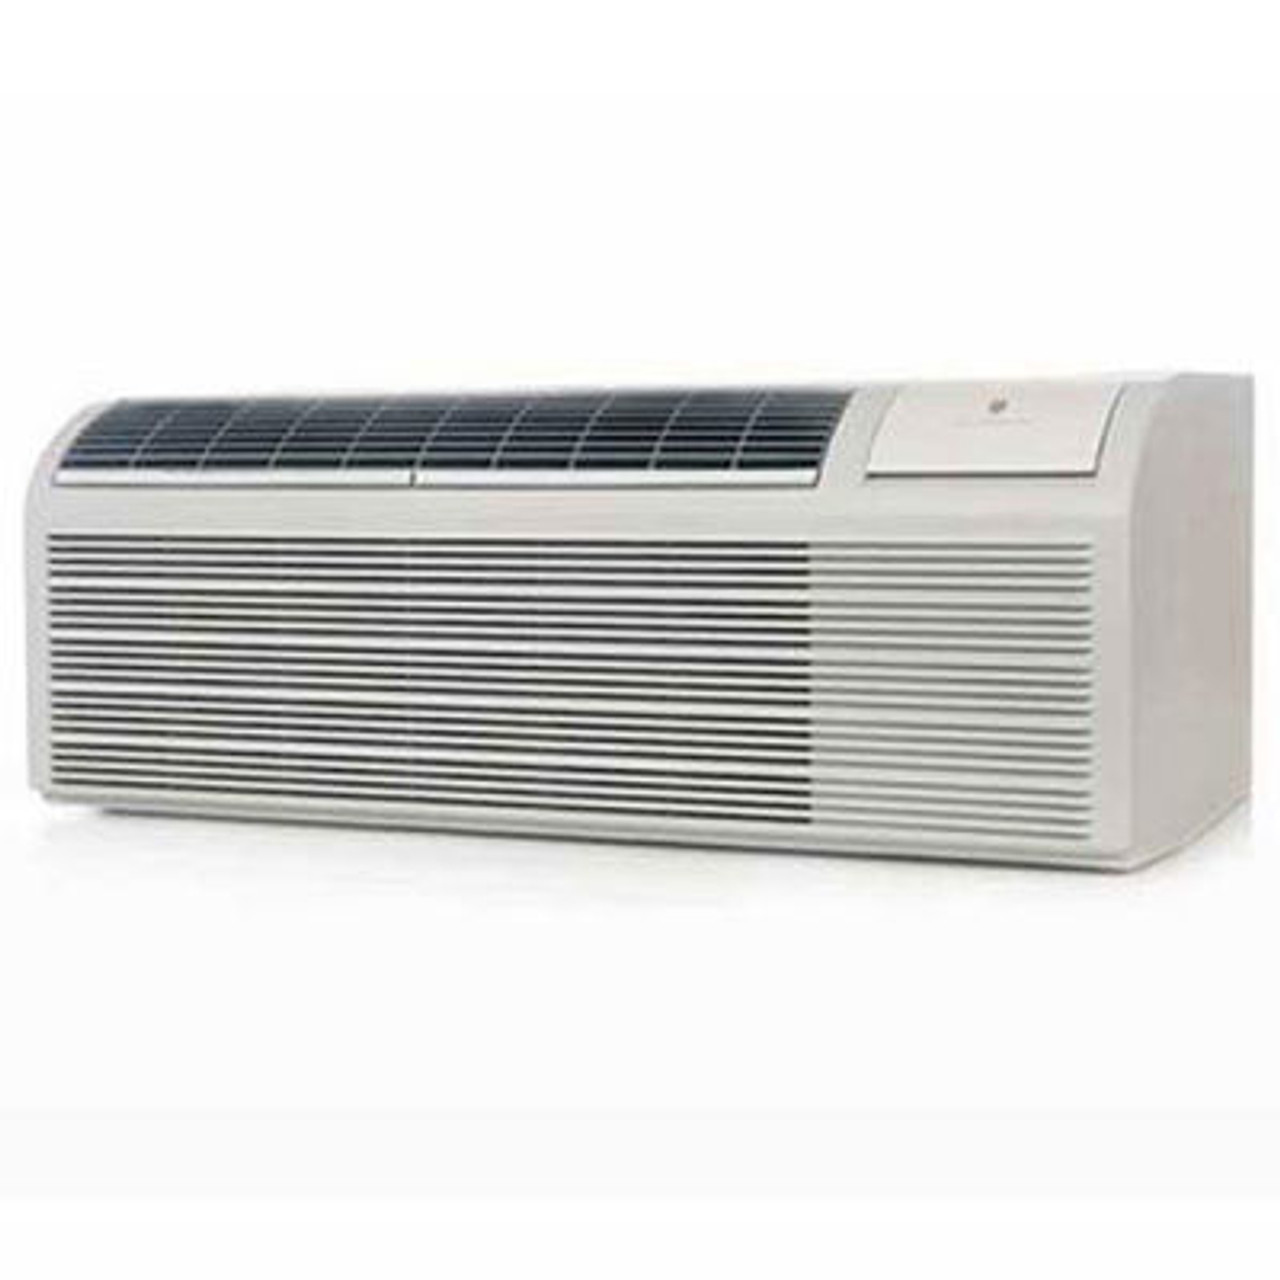 "Friedrich 12,000 BTU 230/208V 42"" PTAC w/ Electric Heat"